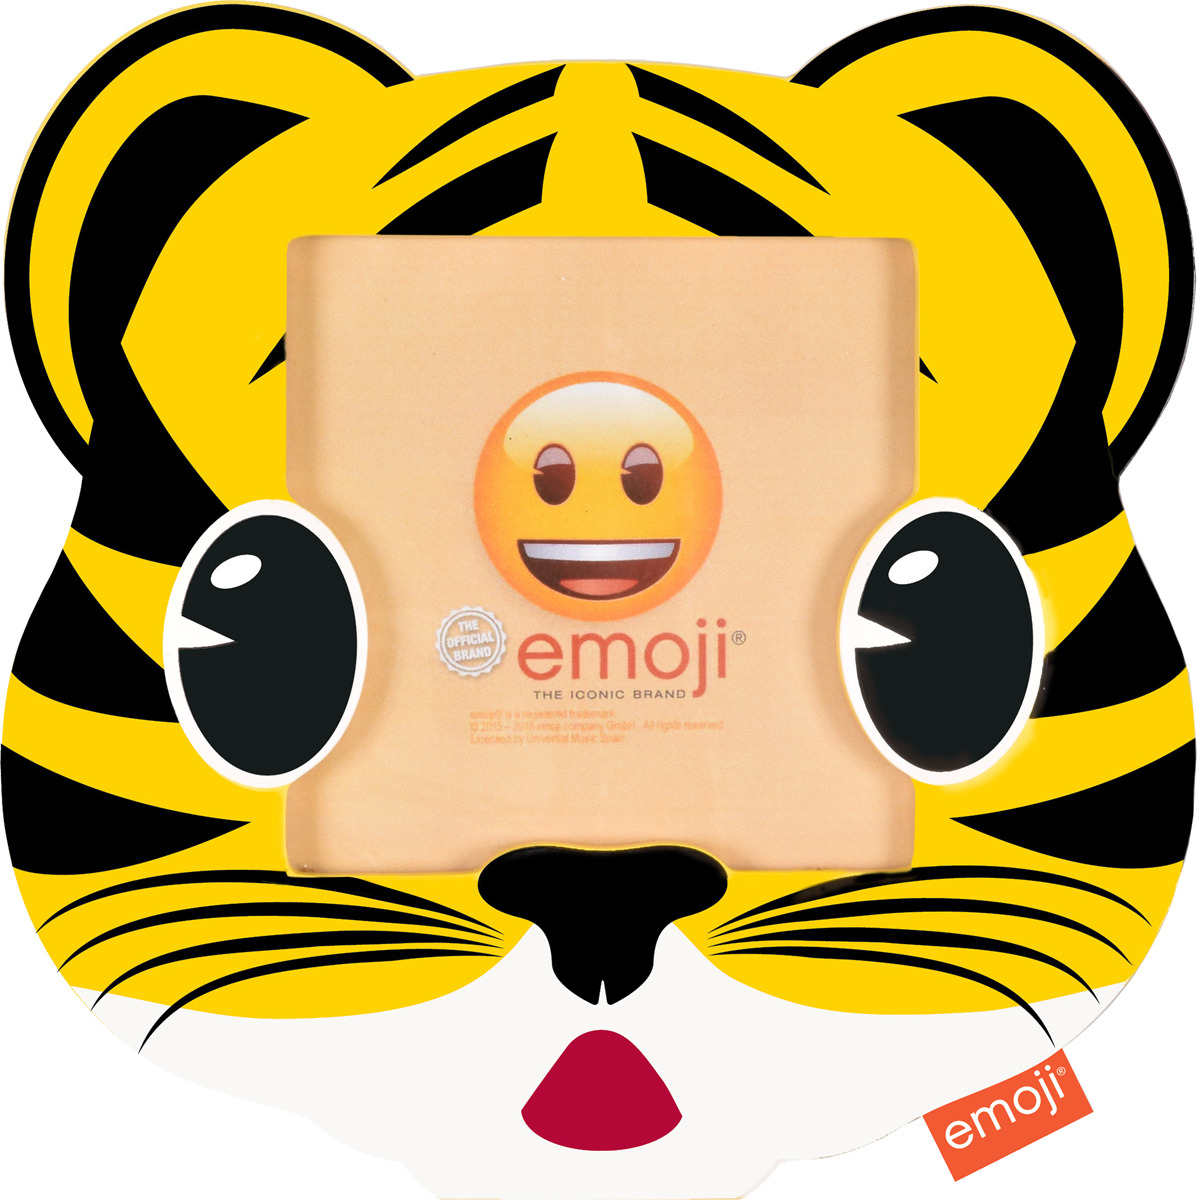 Фоторамка Innova Emoji Tiger, 10 х 10 см